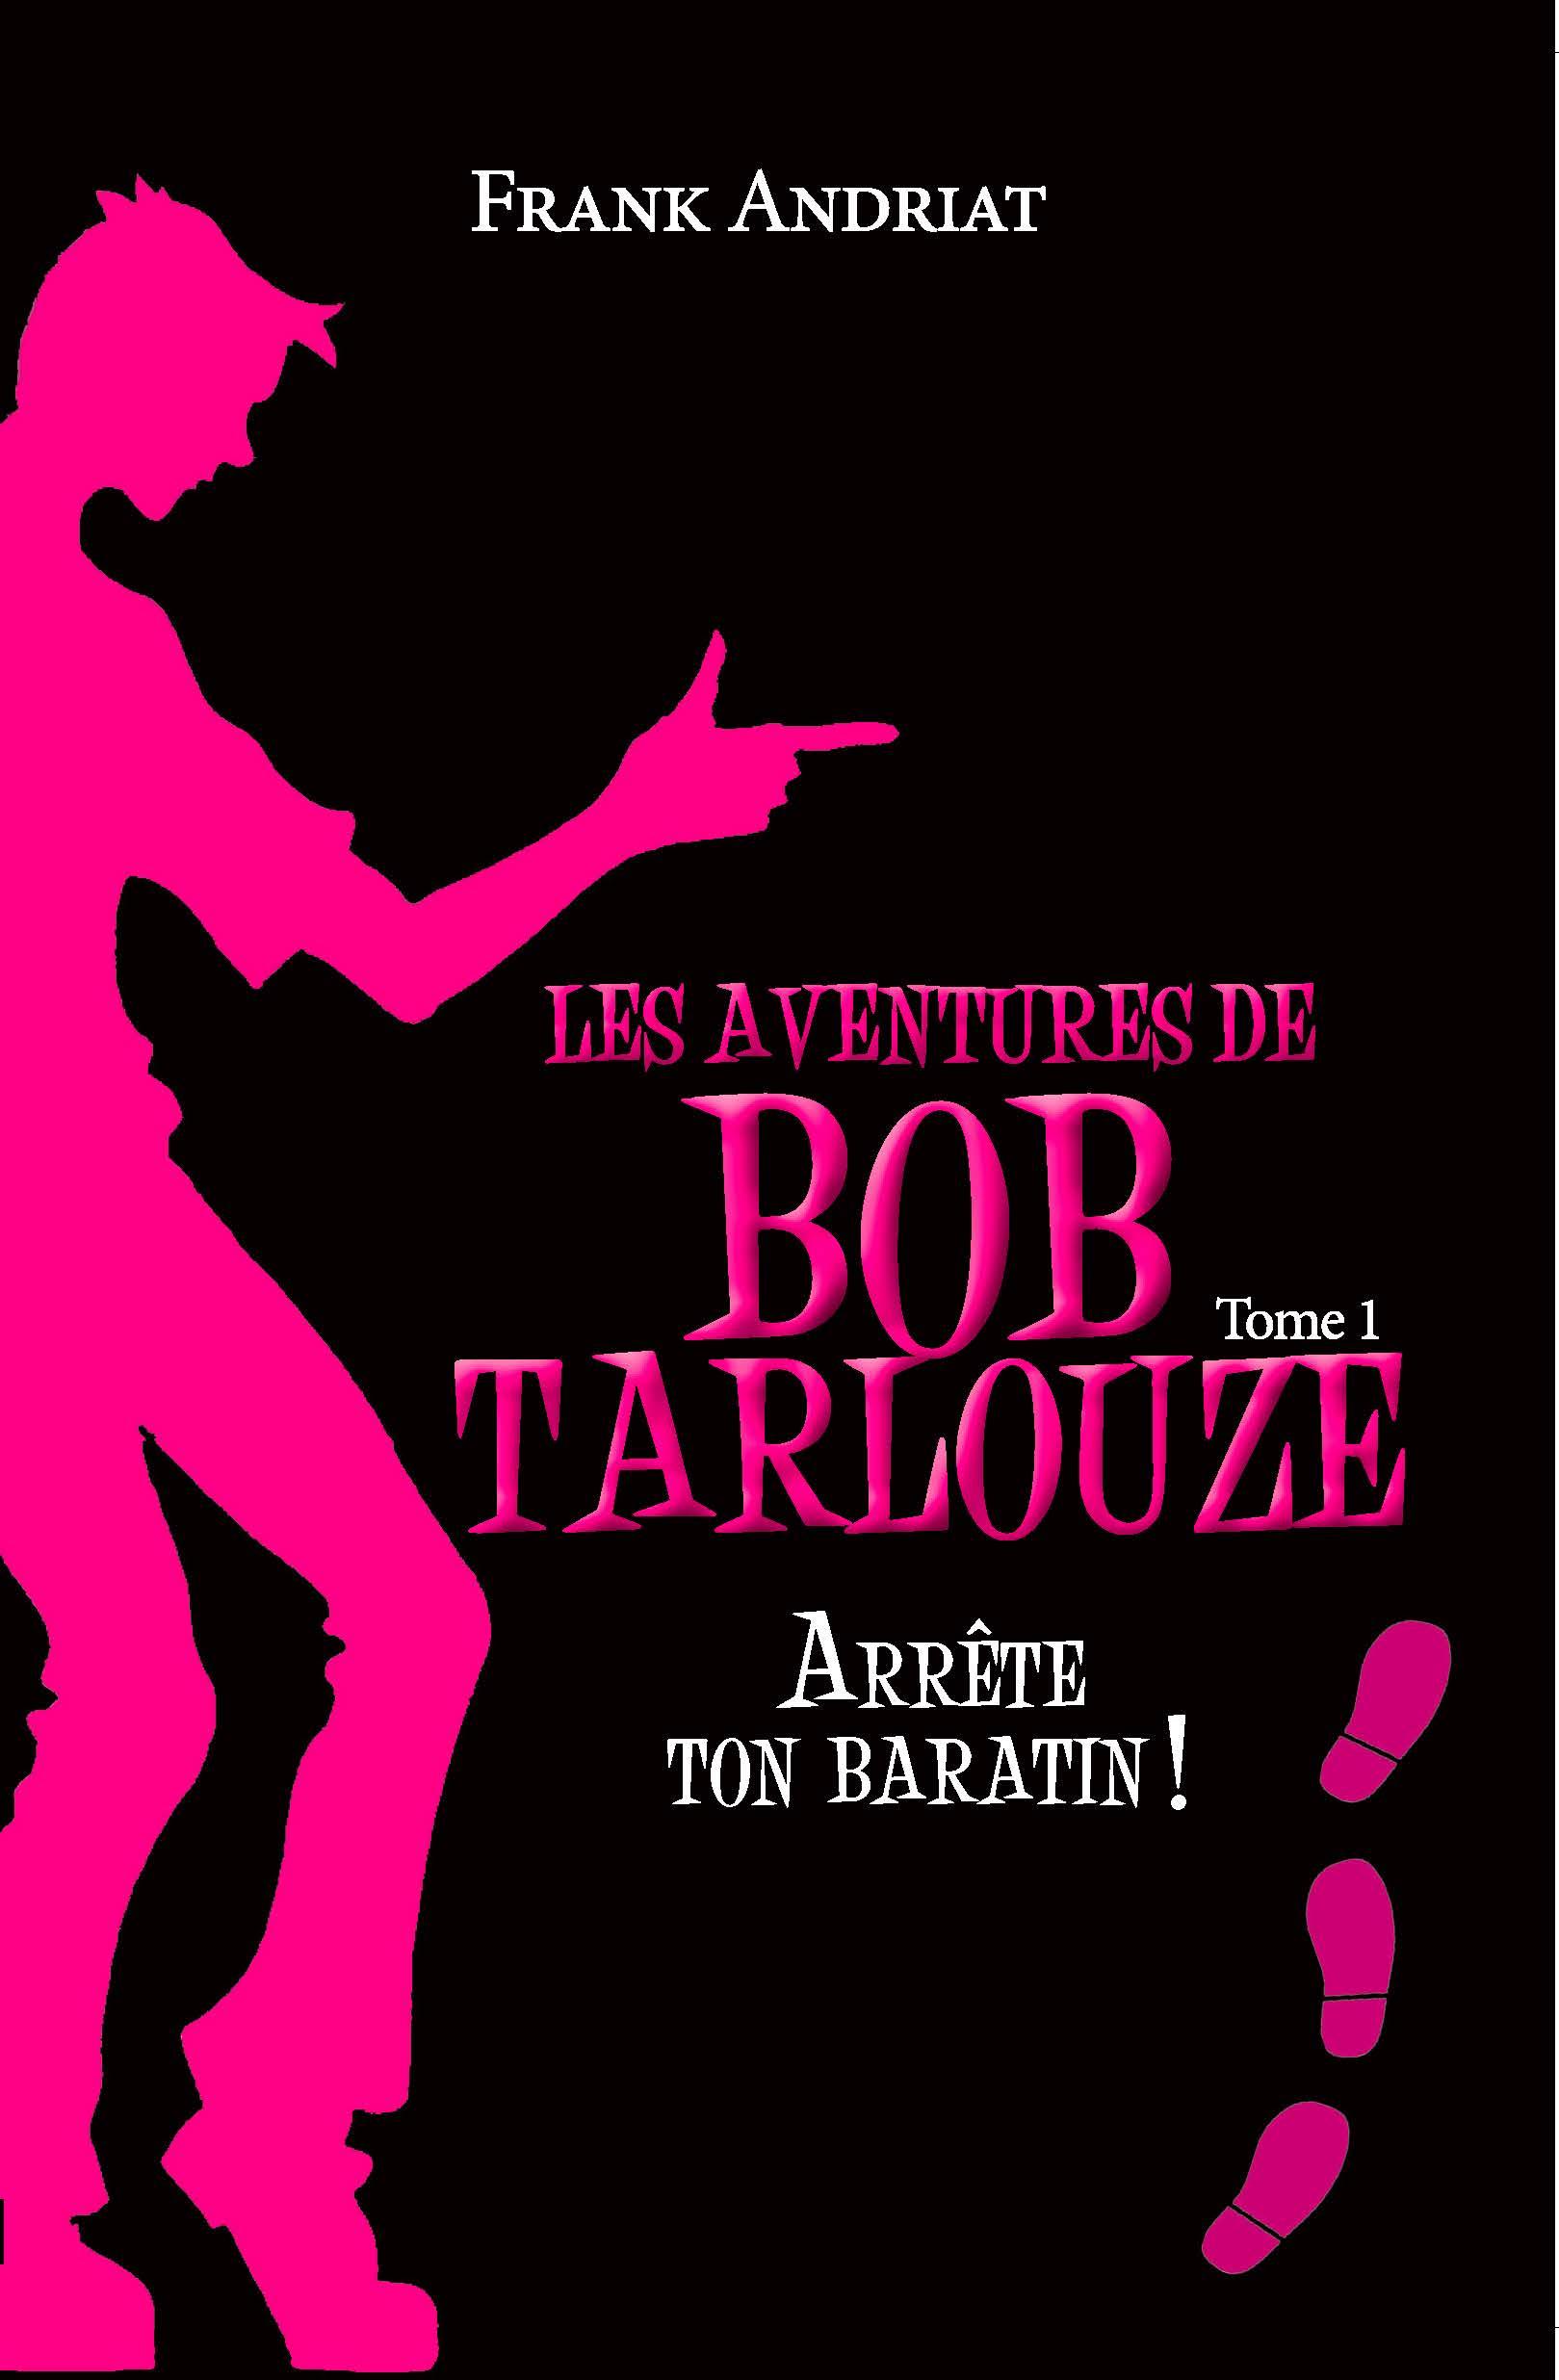 Bob Tarlouze 1